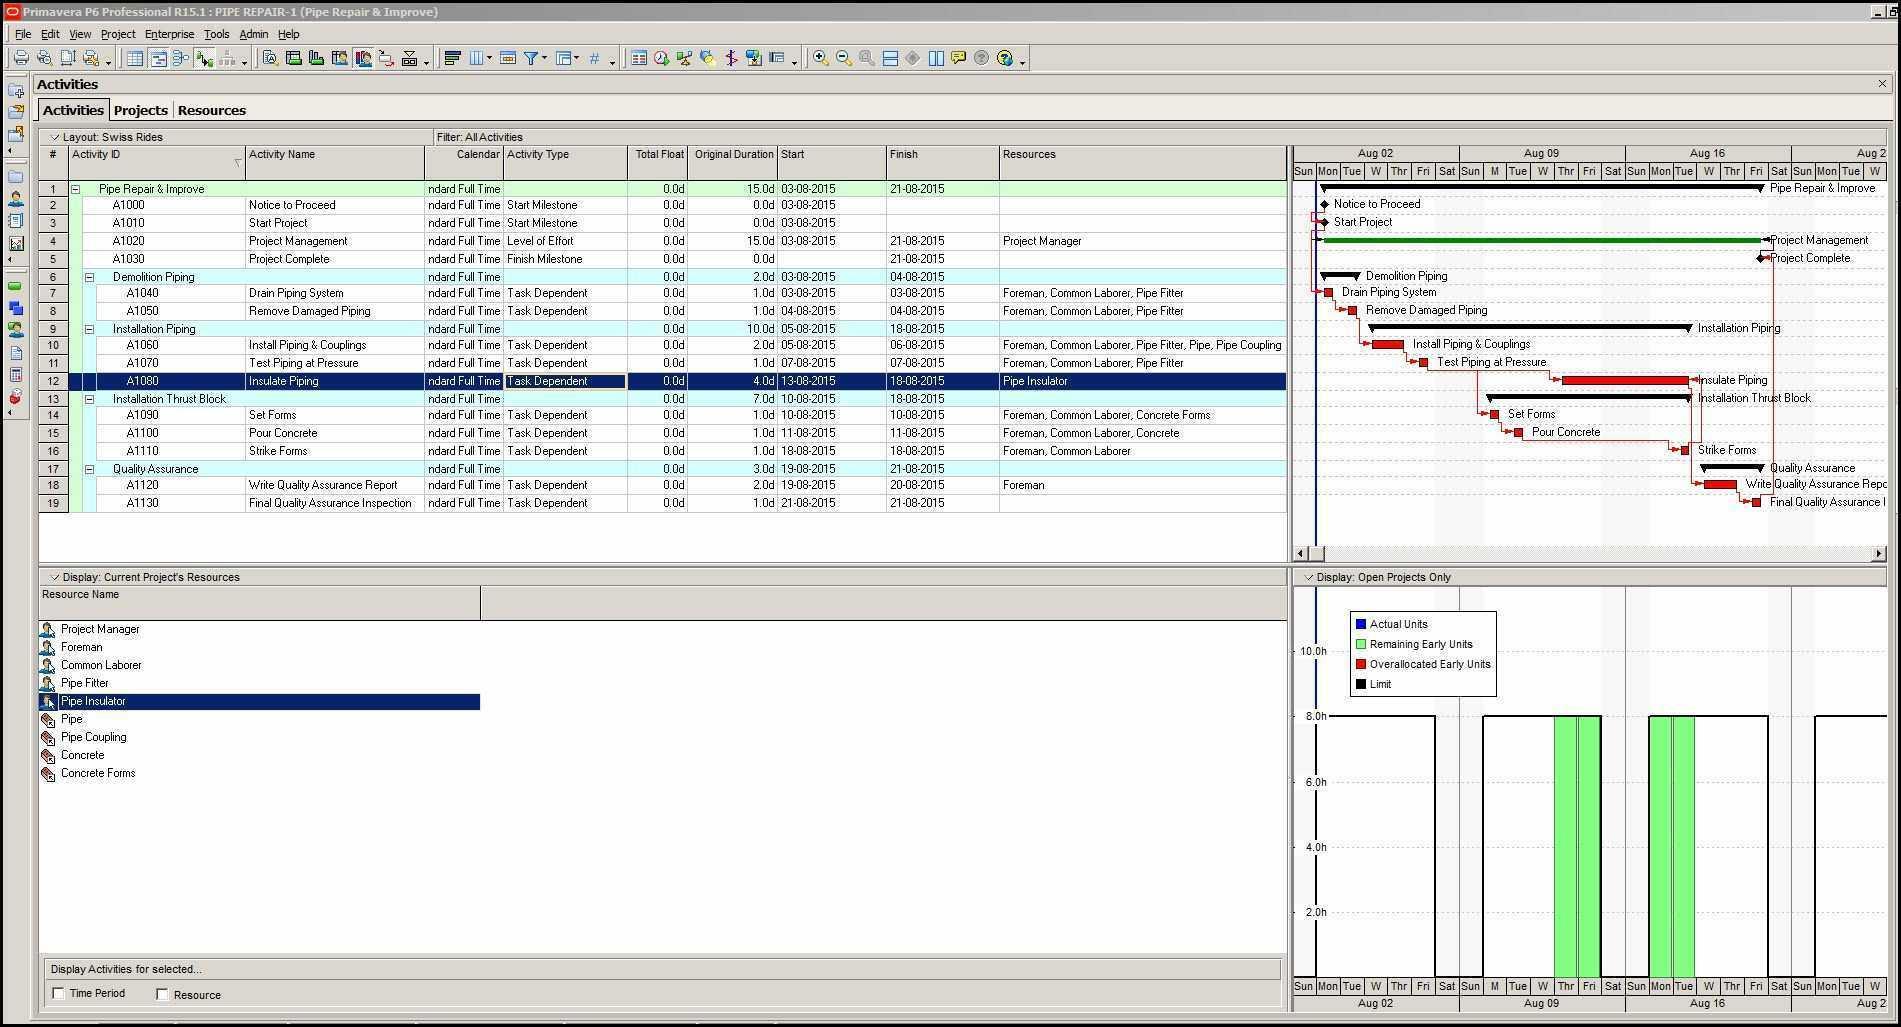 Excel Spreadsheet Timeline | My Spreadsheet Templates Within Timeline Spreadsheet Template